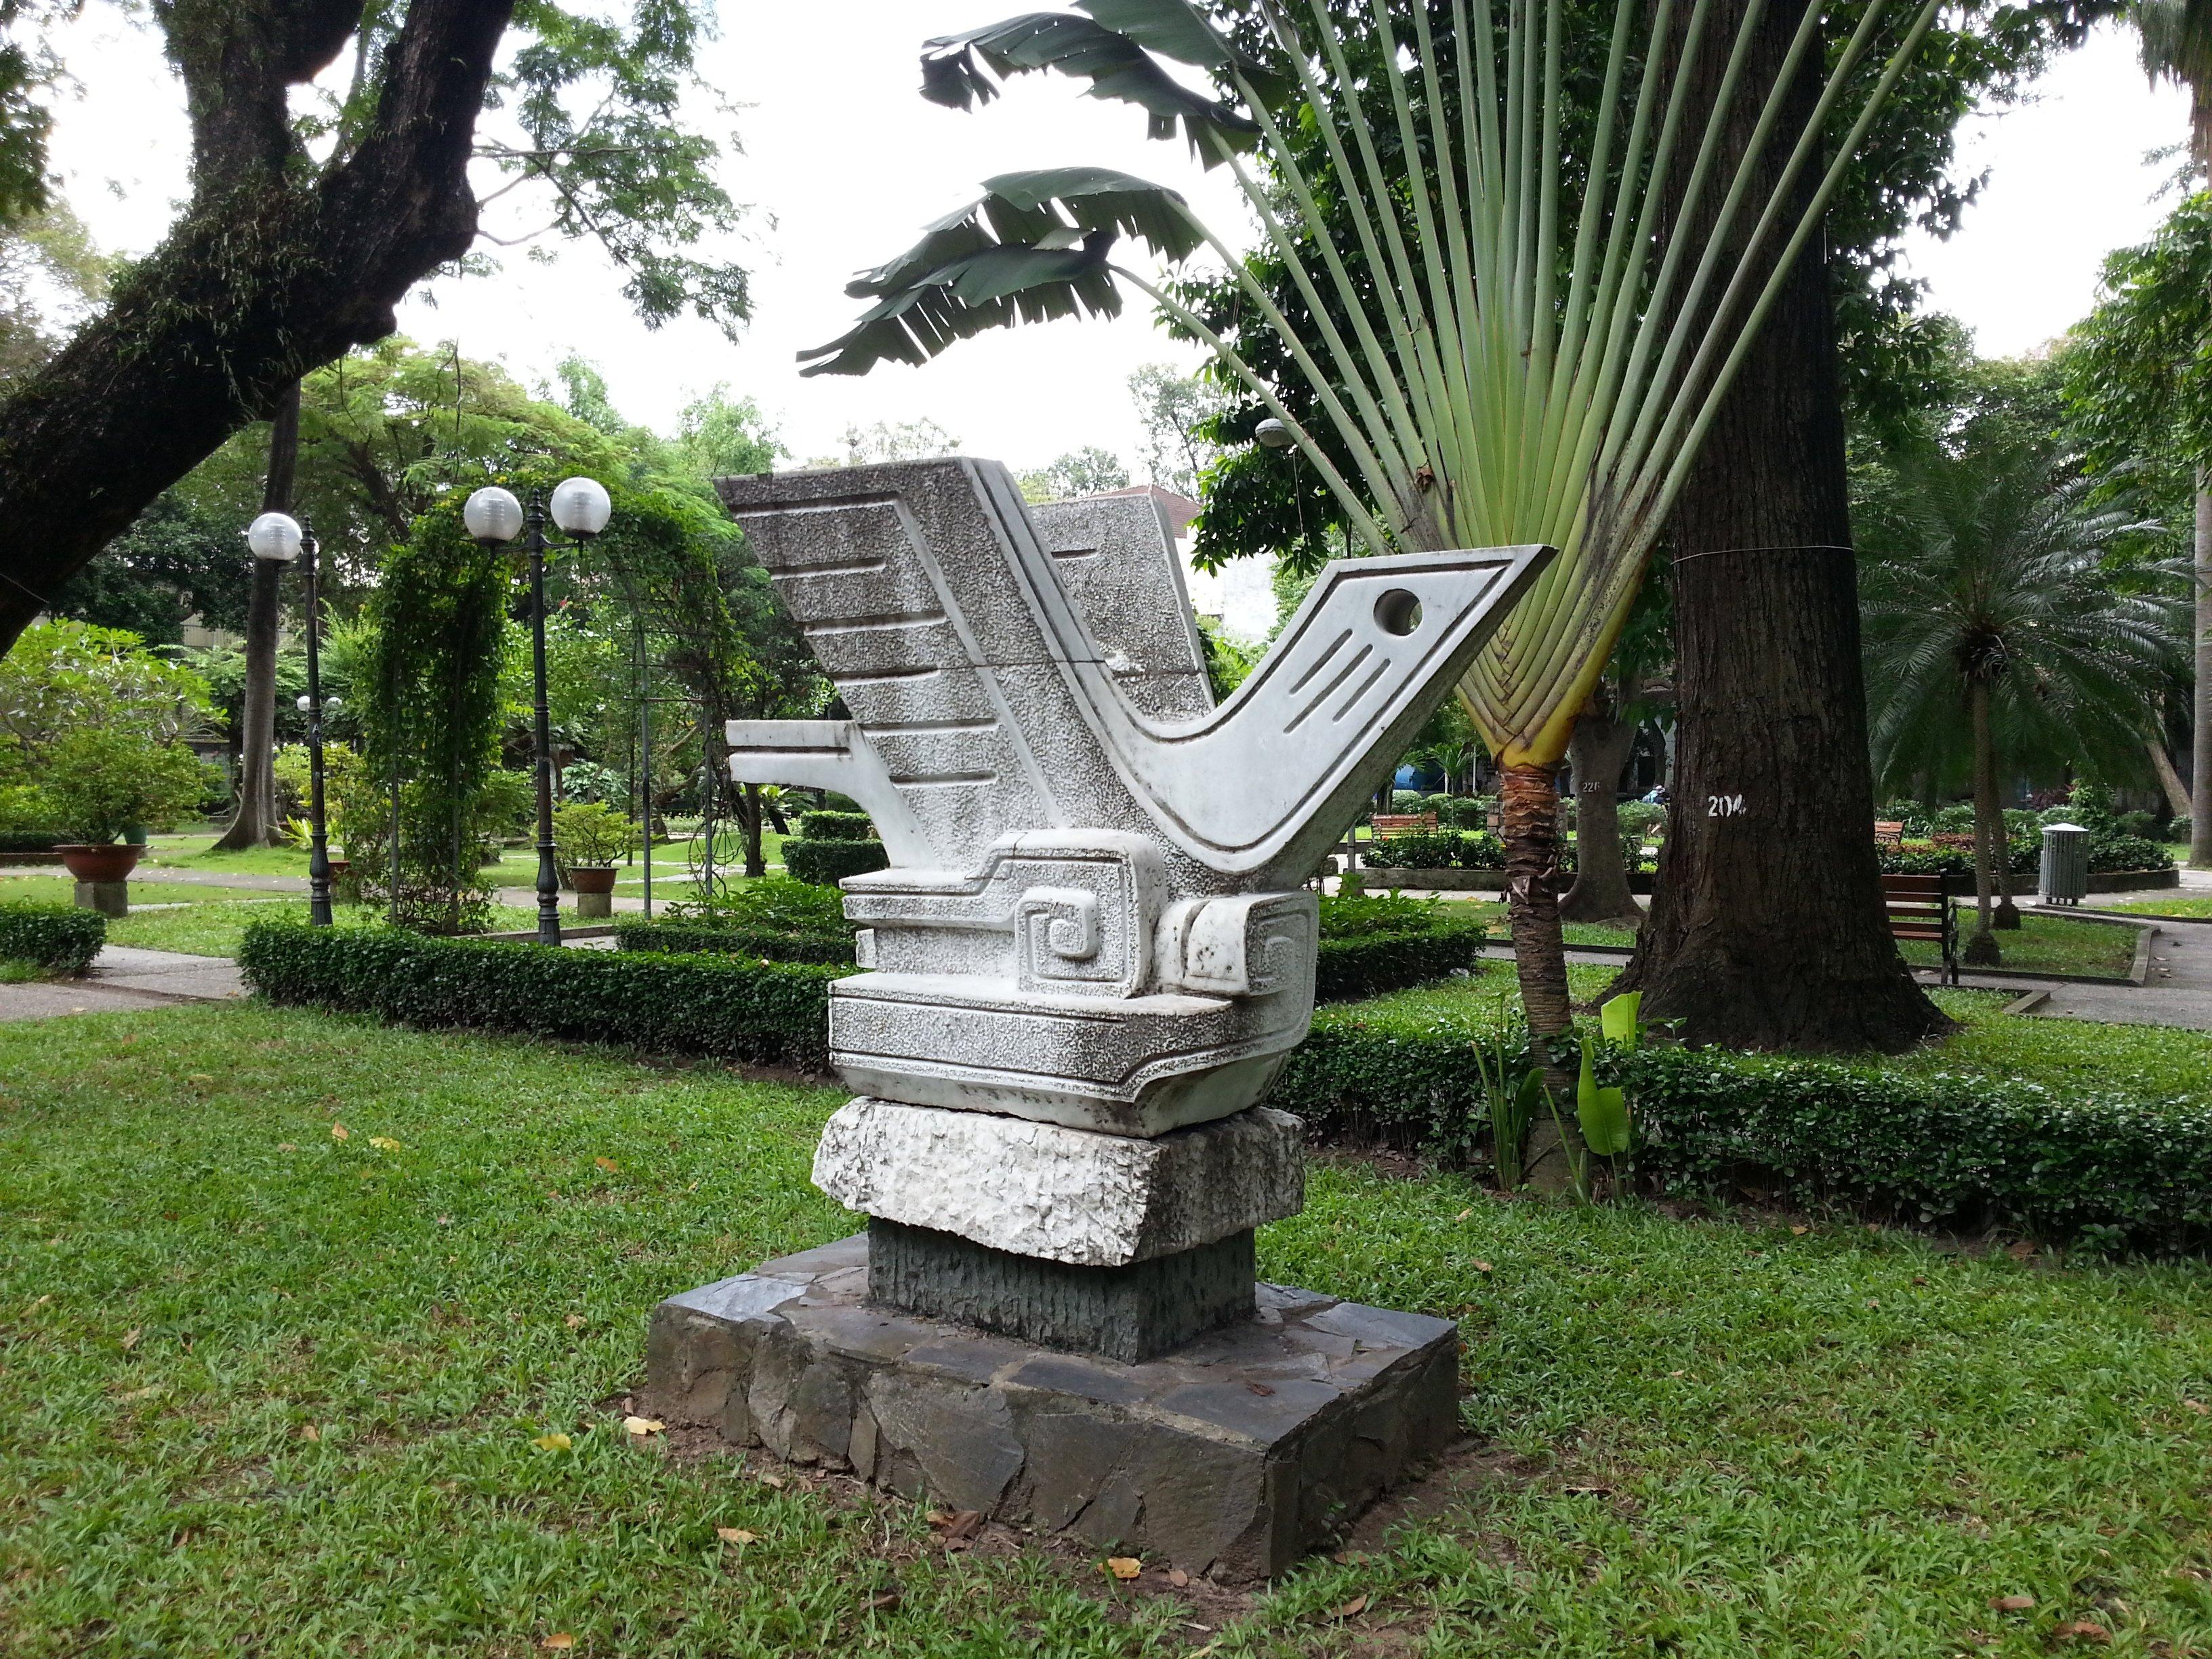 Sculpture in Tao Dan Park